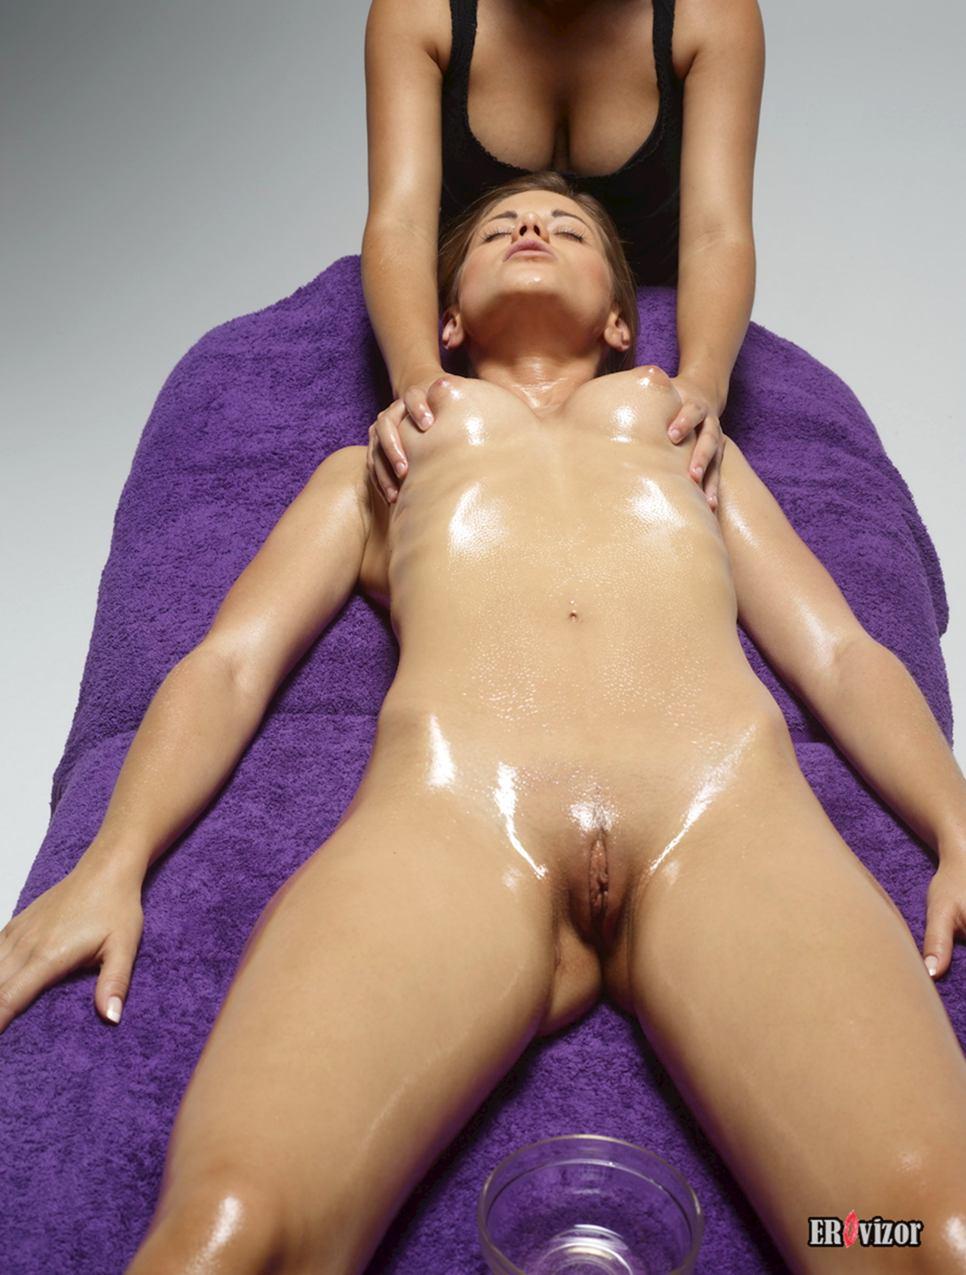 массаж для девушки (4)